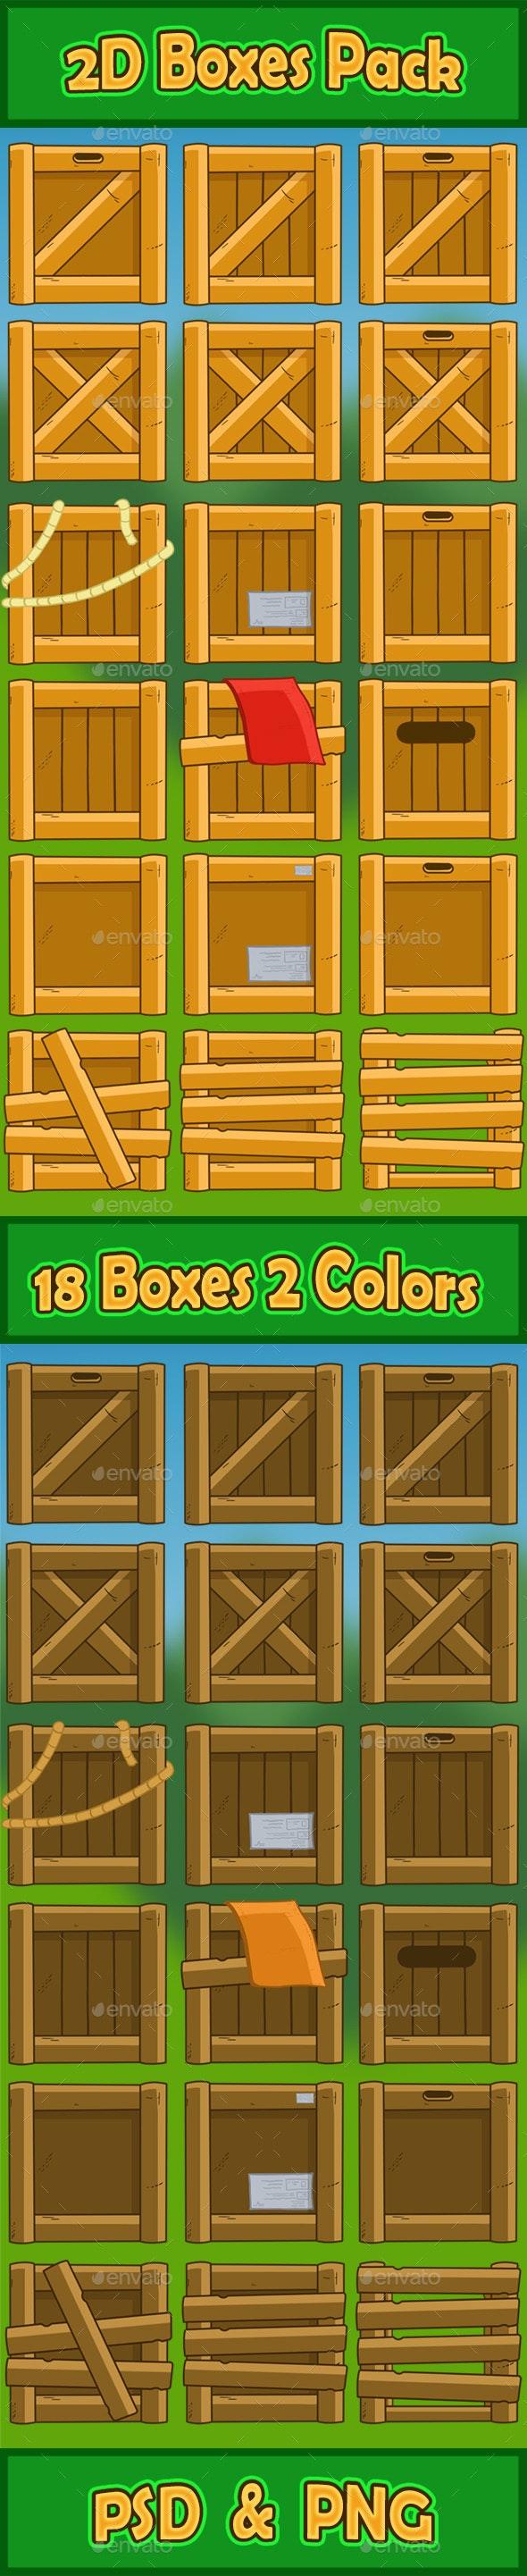 2D Boxes Pack - Sprites Game Assets